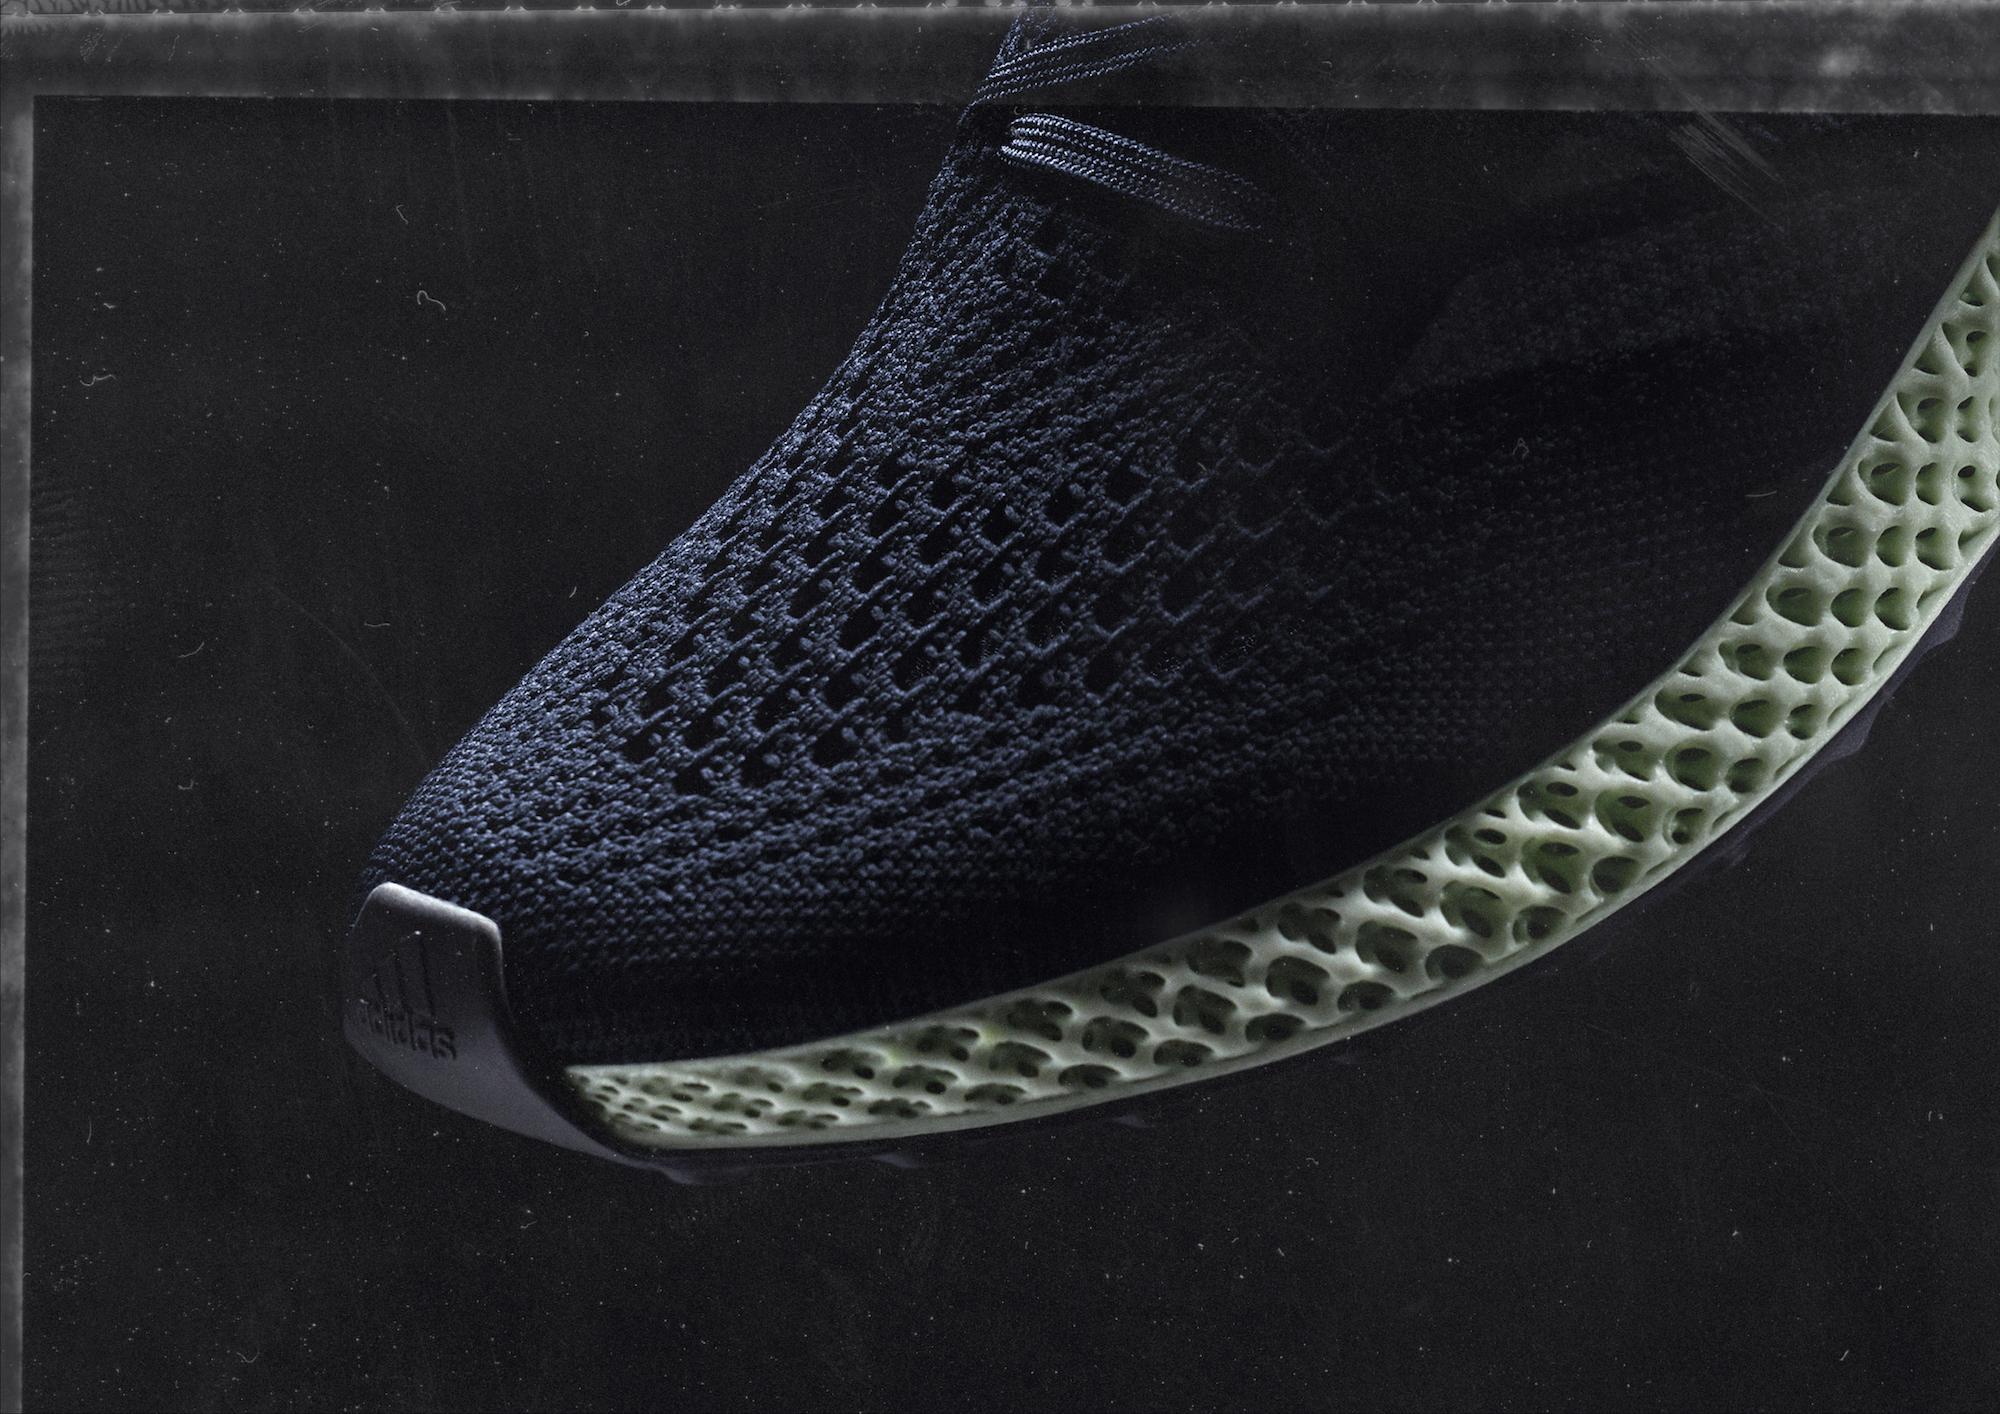 Adidas Futurecraft 4d Stockx c6NbSGb